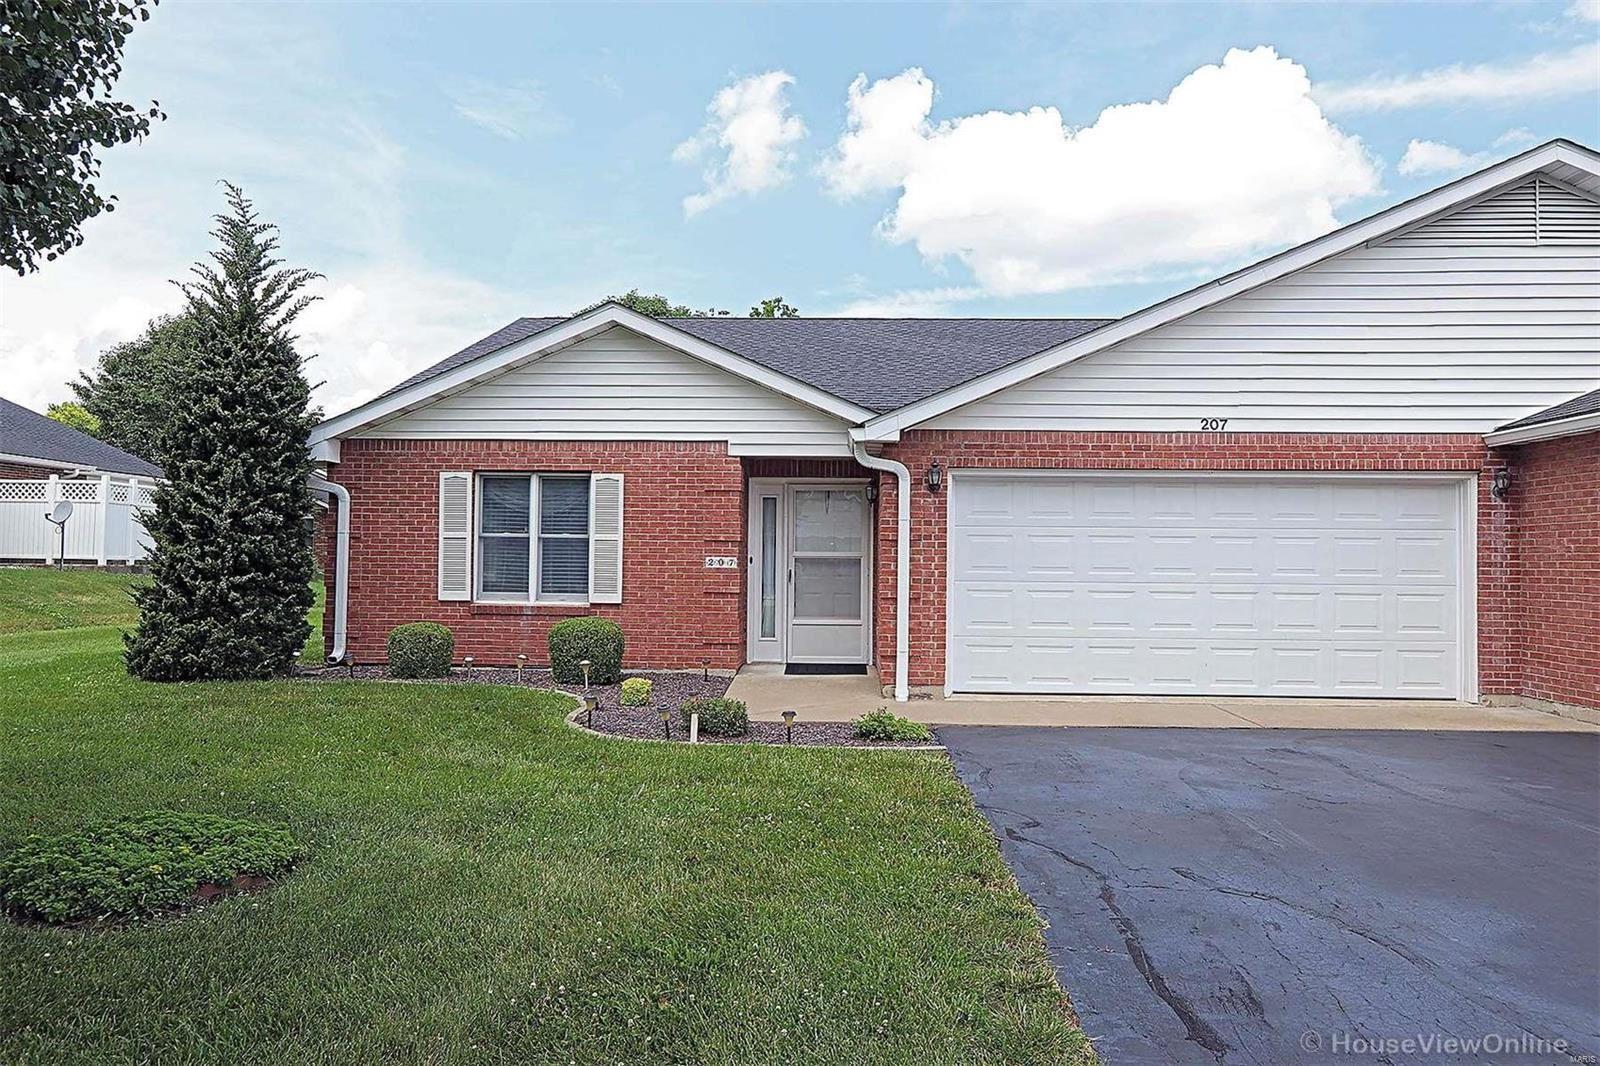 207 Bayberry, Farmington, MO 63640 - MLS#: 21045930